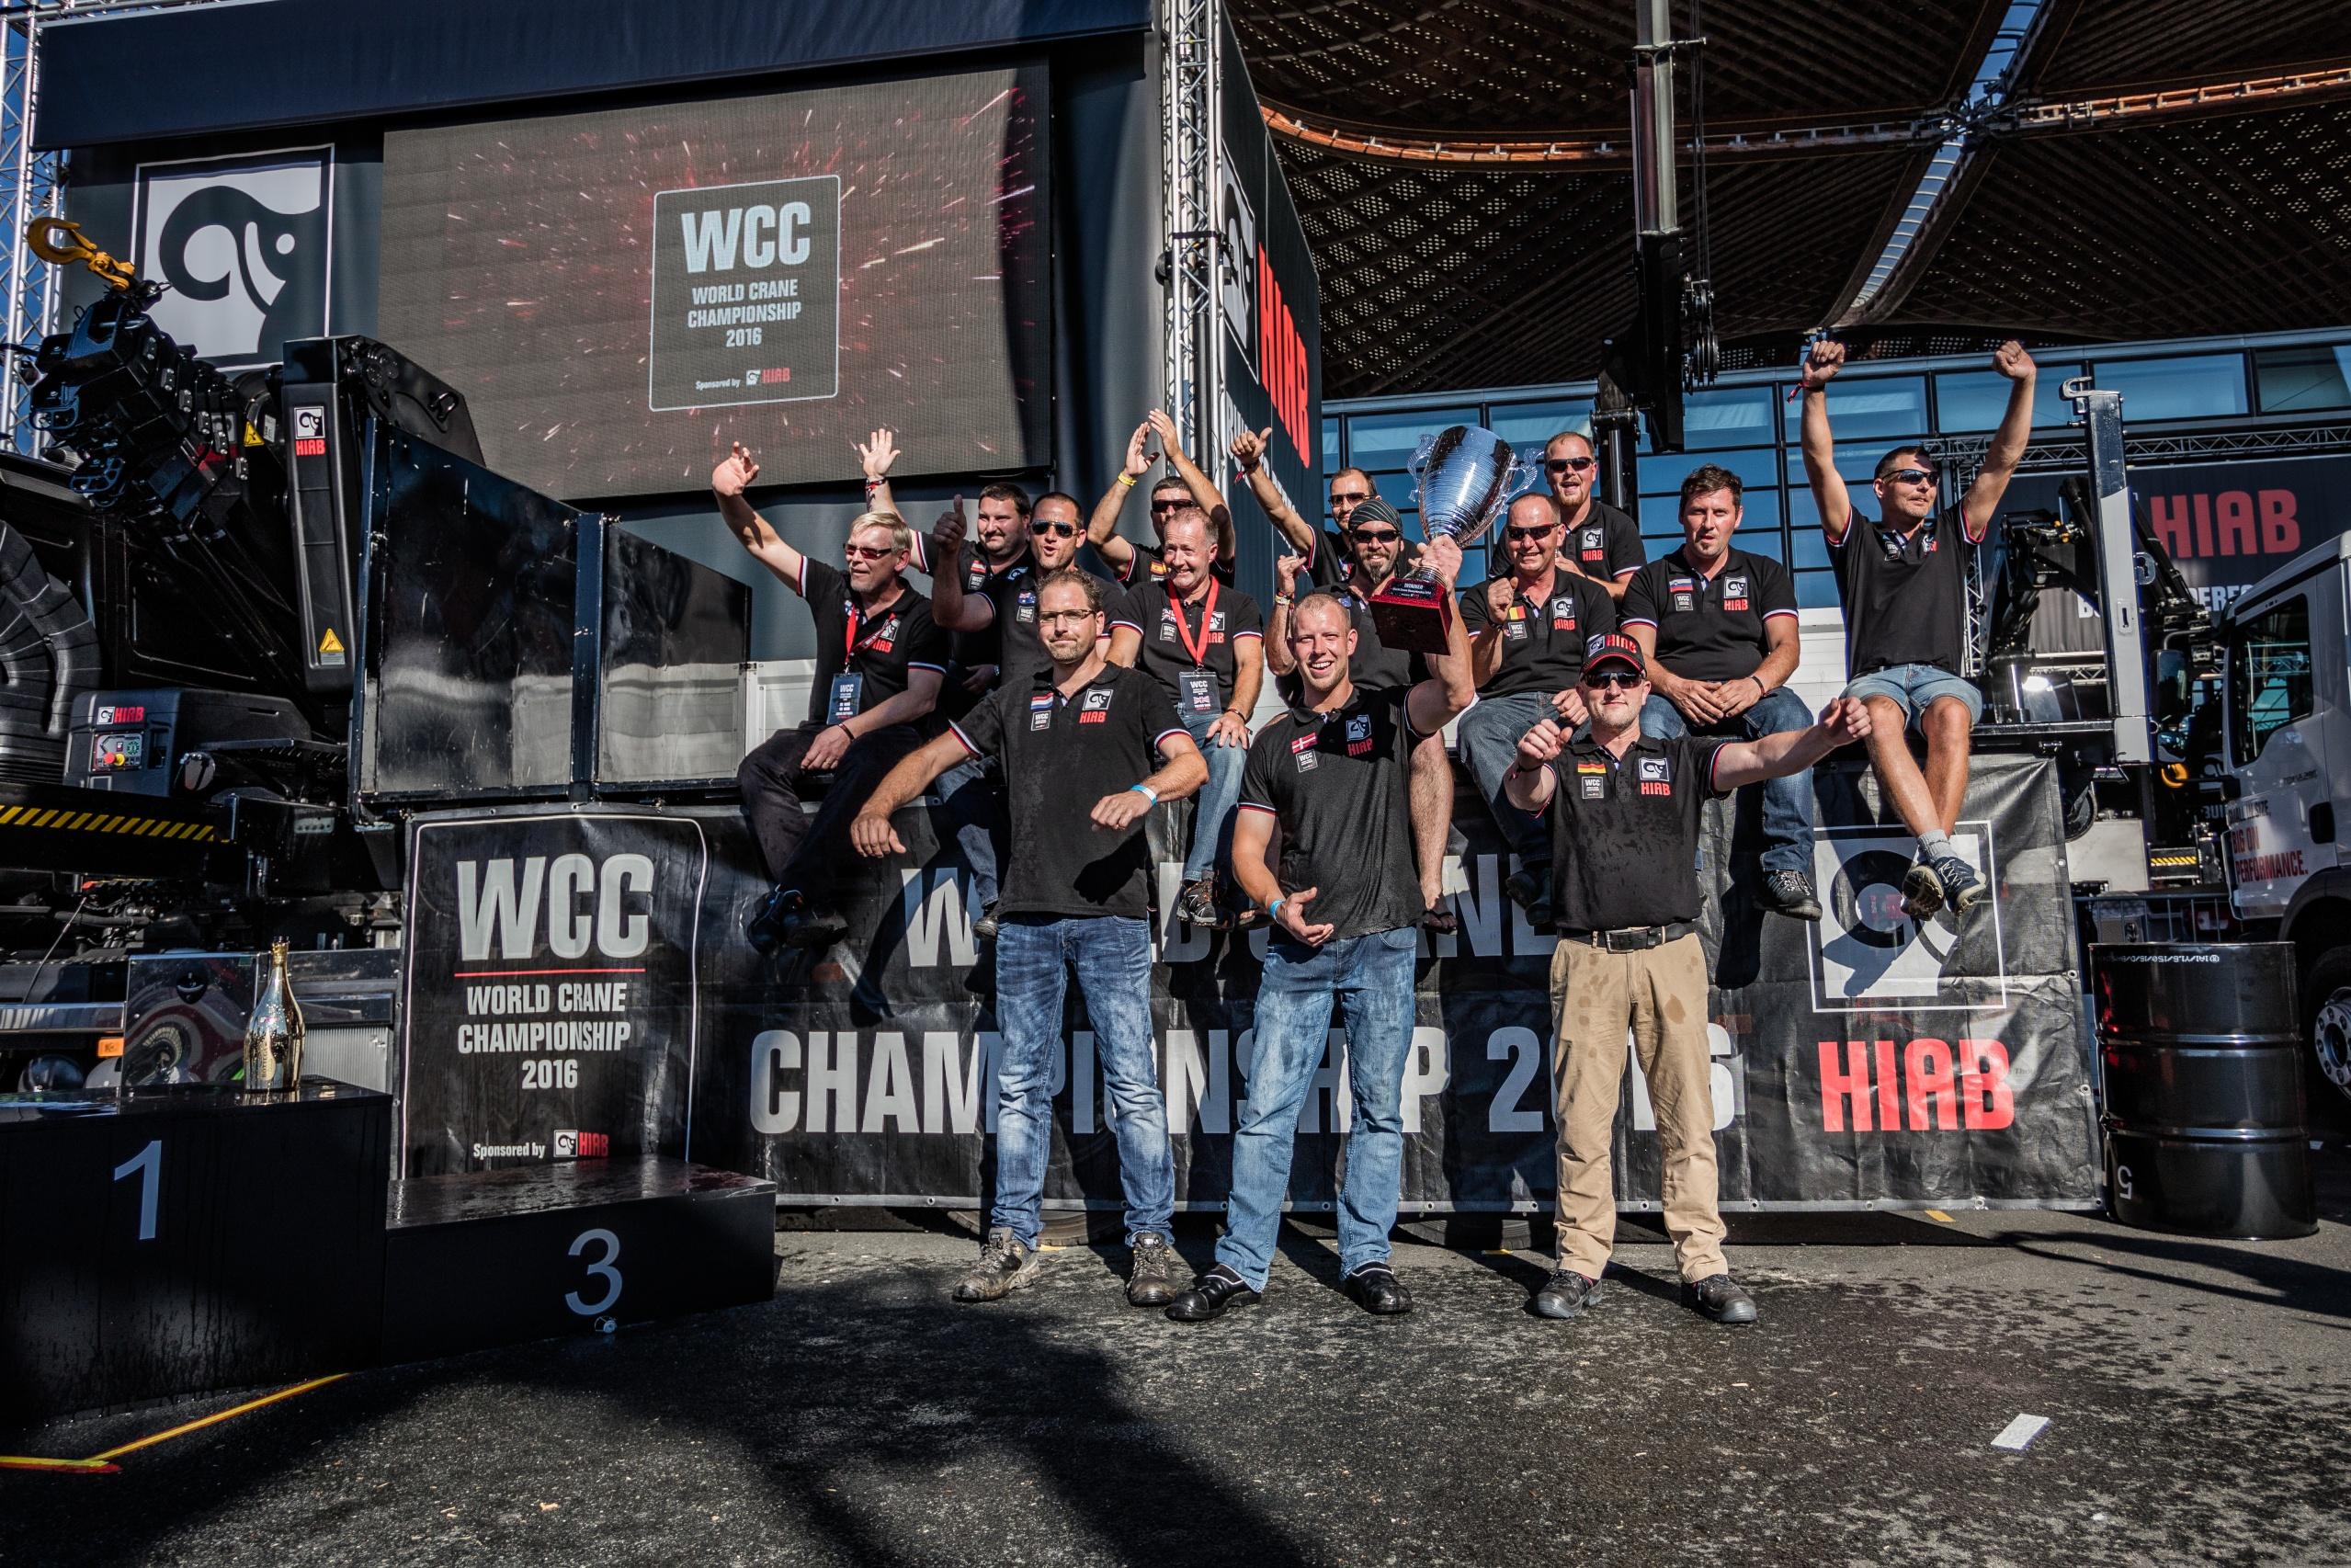 HIAB World Crane Championship at IAA 2016